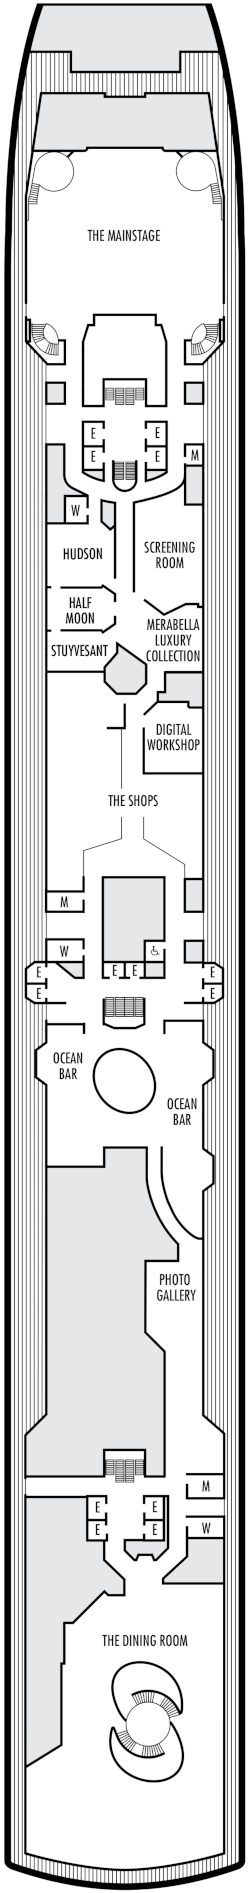 Oosterdam Promenade Deck Plan